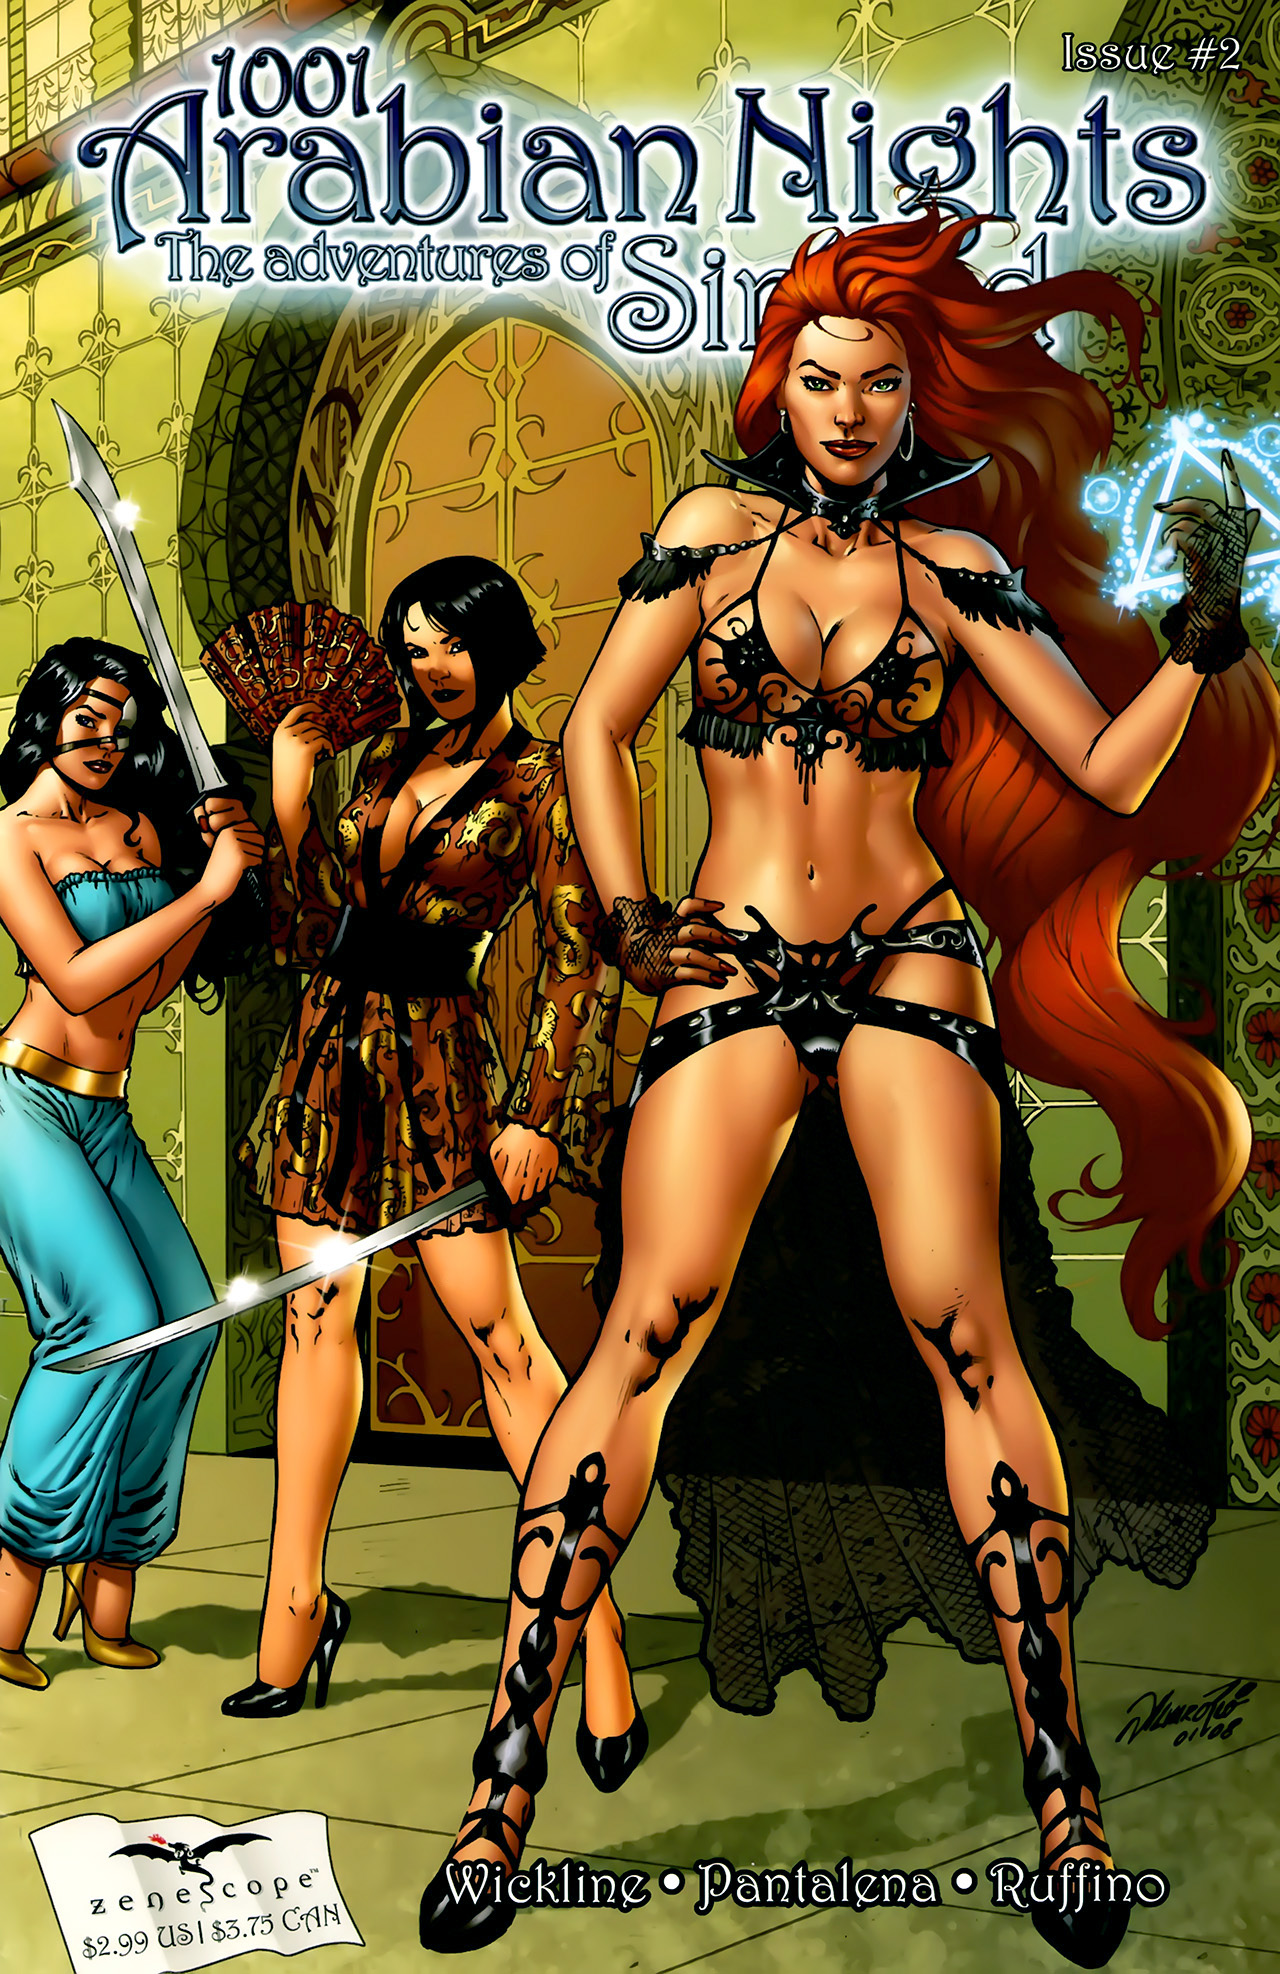 Read online 1001 Arabian Nights: The Adventures of Sinbad comic -  Issue #2 - 2